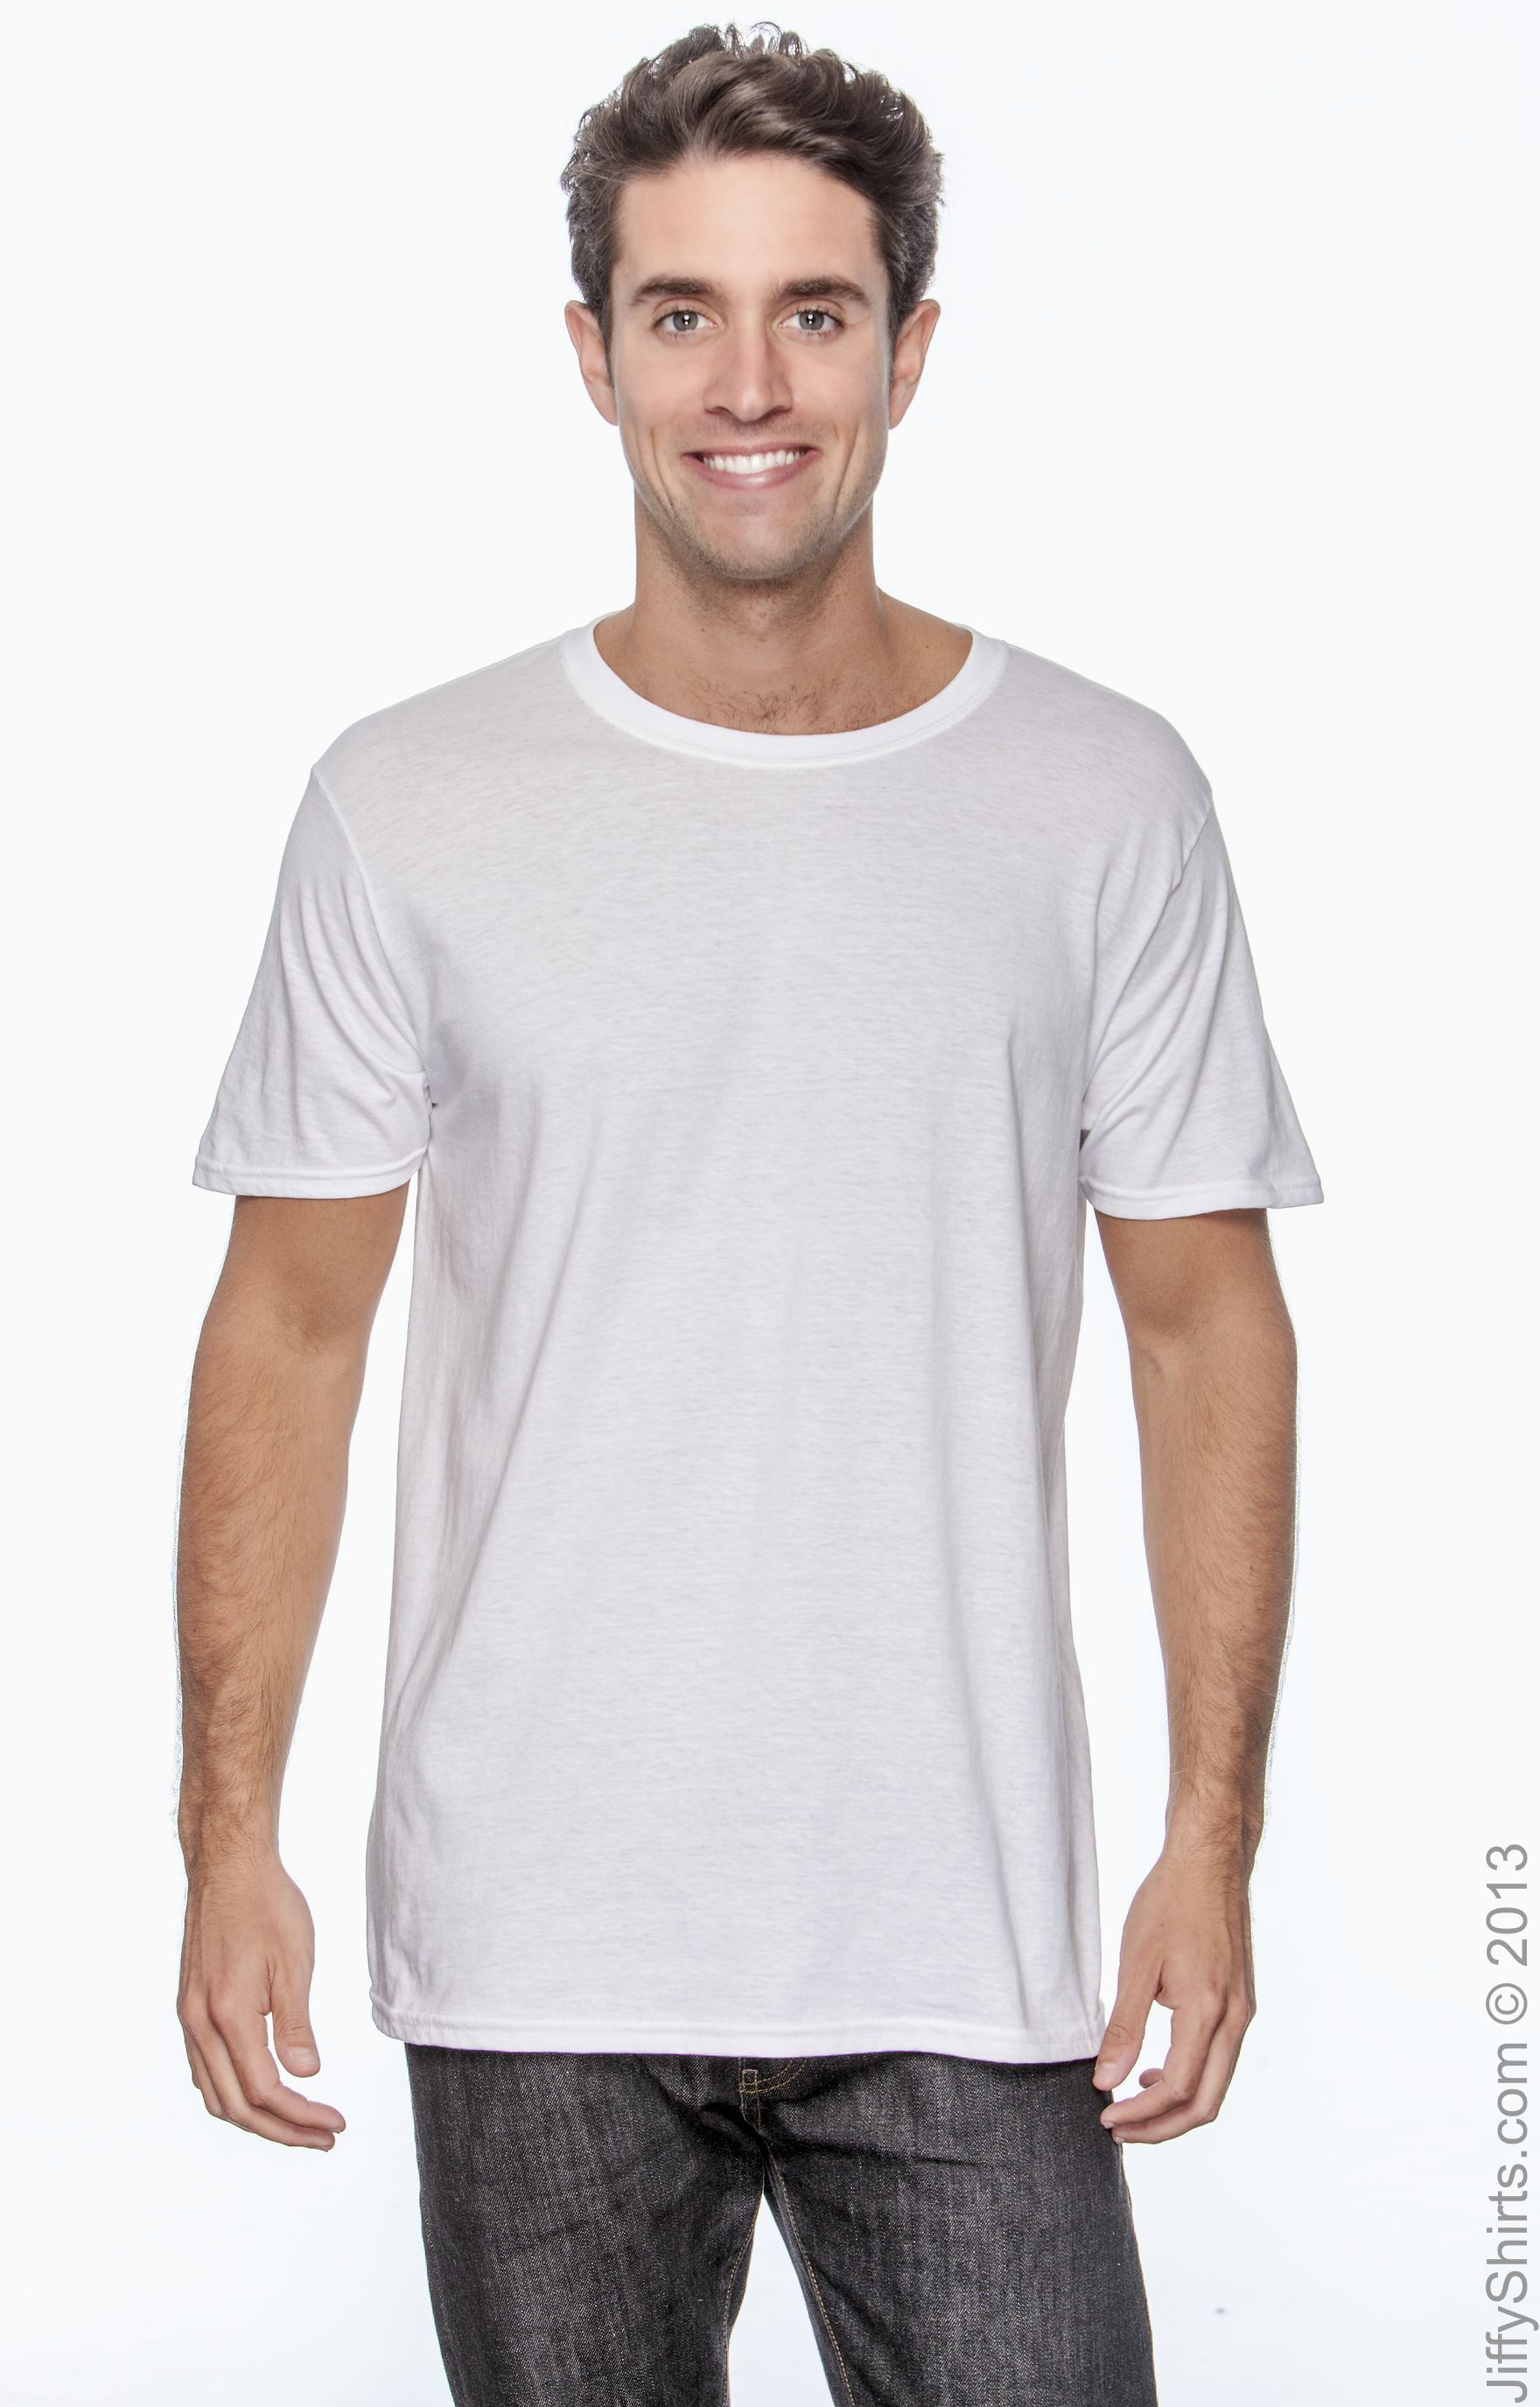 Gildan T-Shirt high qualit Tee Men/'s Short Sleeve Soft Style Ringspun Solid G640